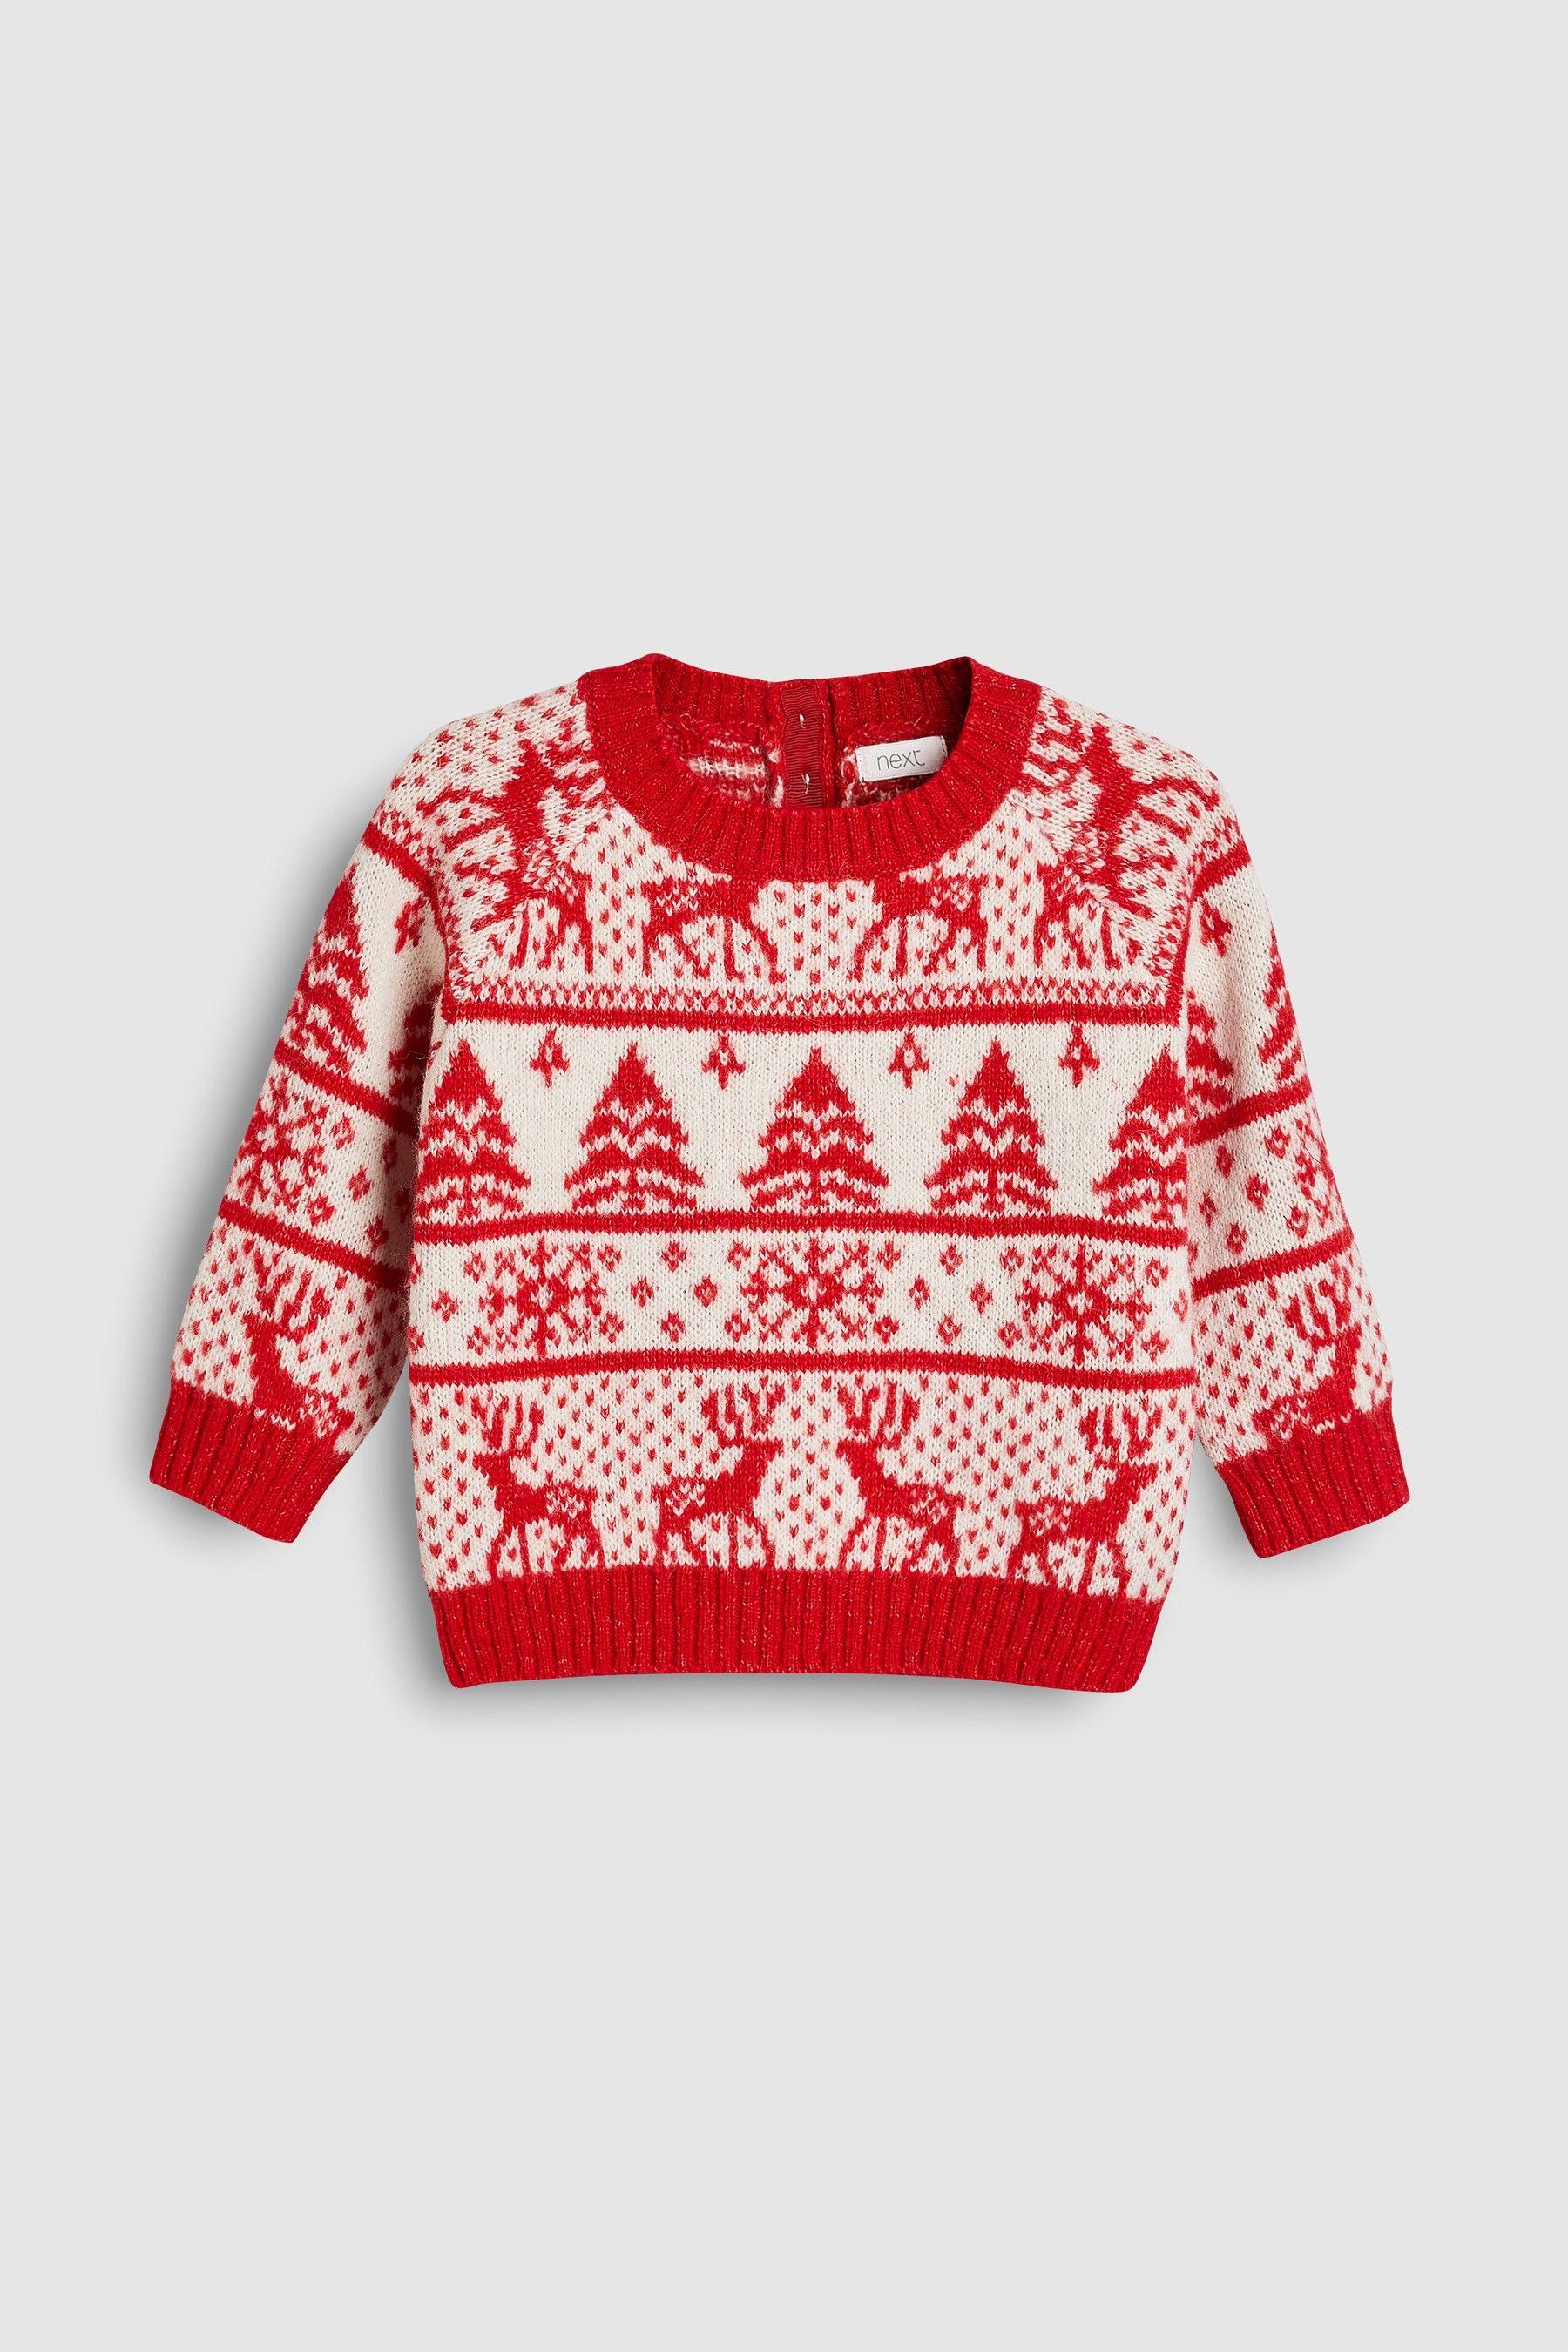 Next Christmas Jumpers.Girls Next Red Fairisle Christmas Jumper 3mths 6yrs Red